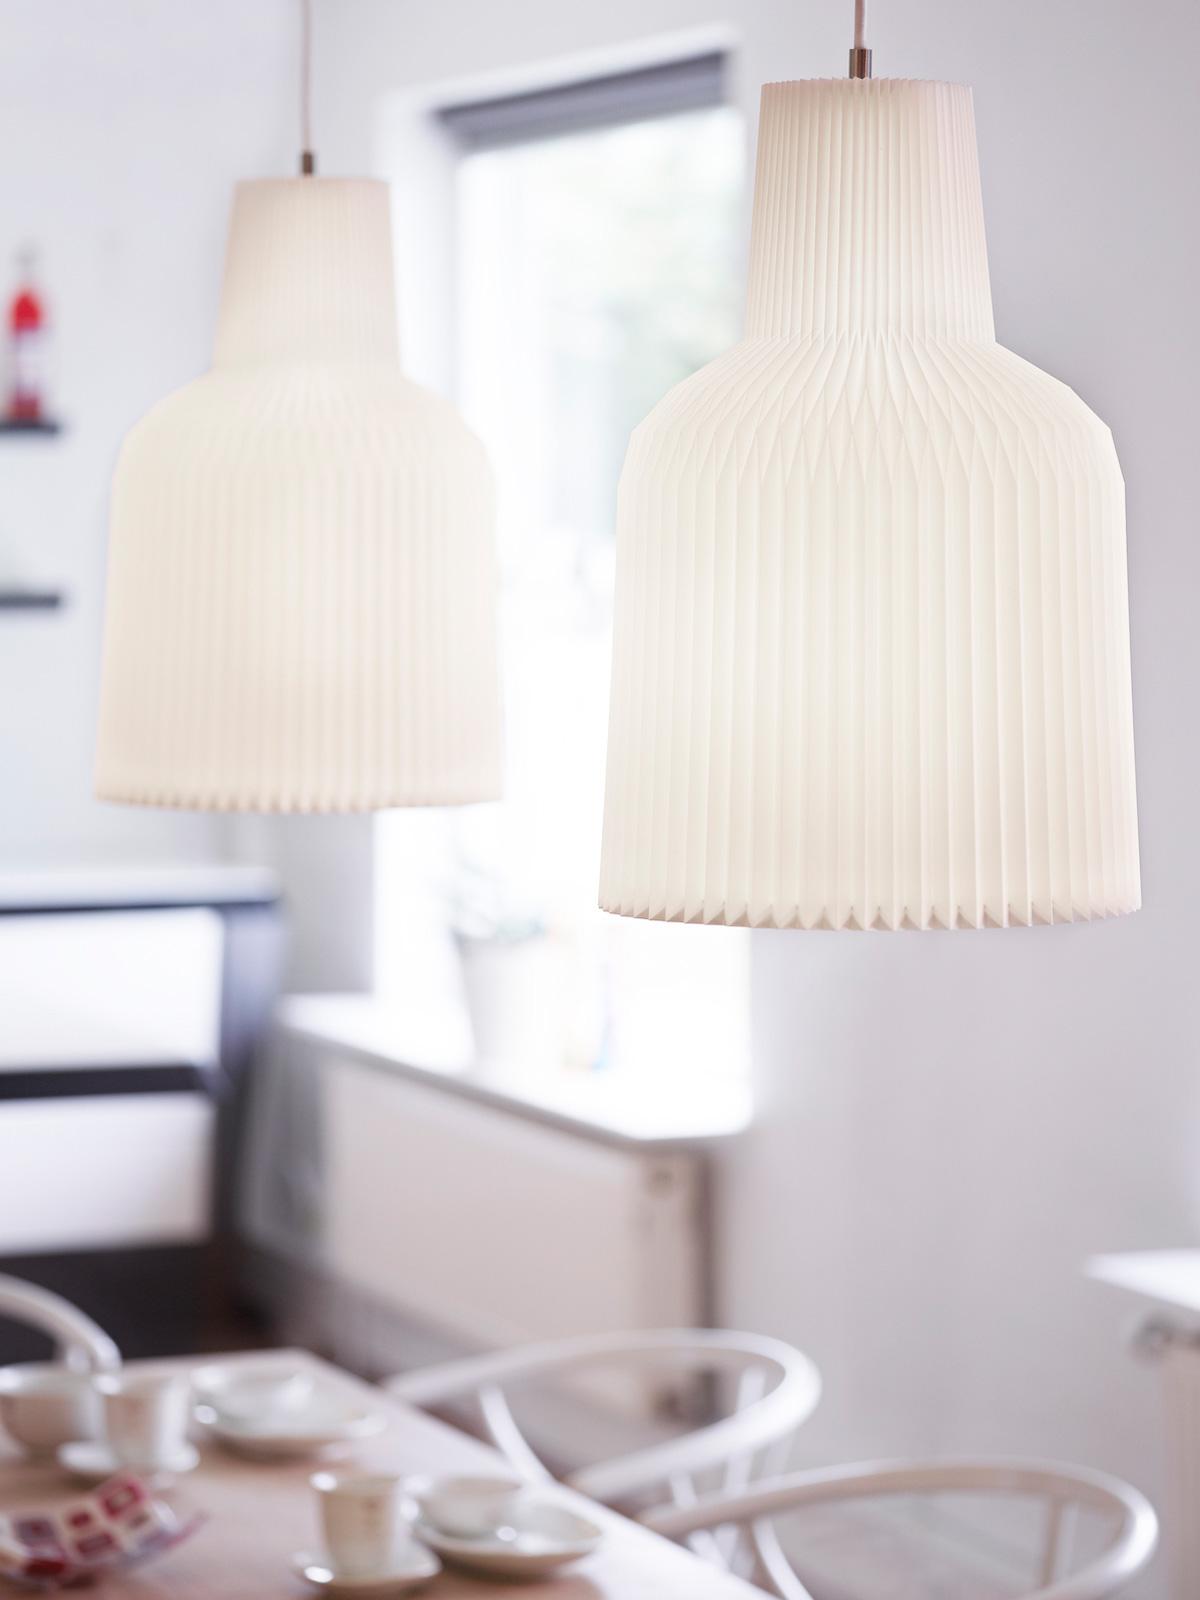 DesignORt Blog: Glockenförmige Leuchten Pendelleuchte La Cloche 145 Le Klint